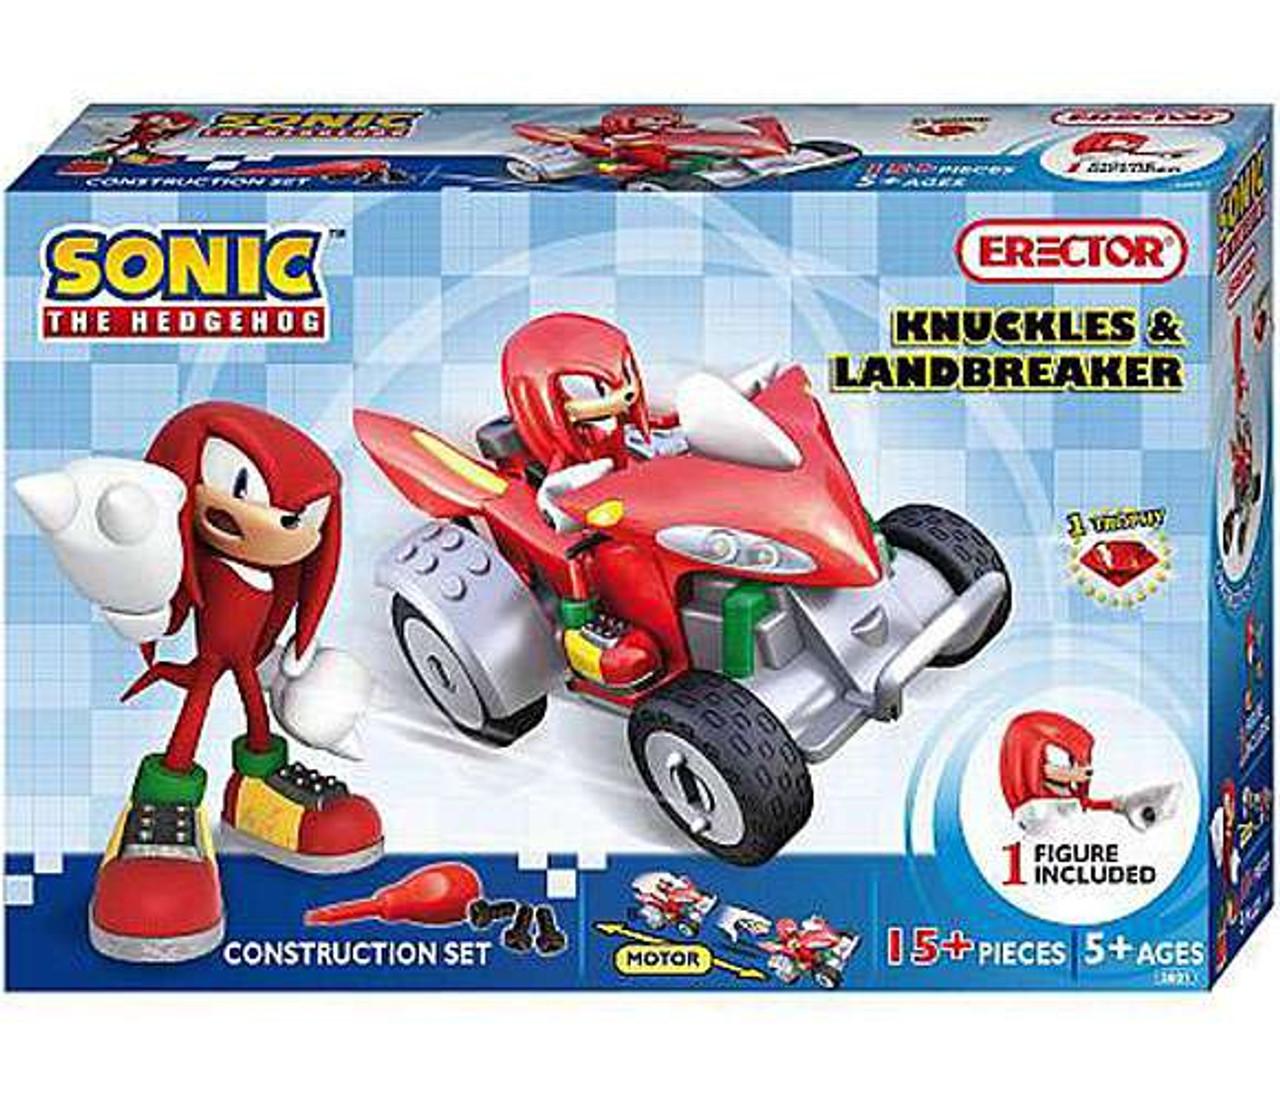 Sonic The Hedgehog Knuckles & Landbreaker Construction Set #5601